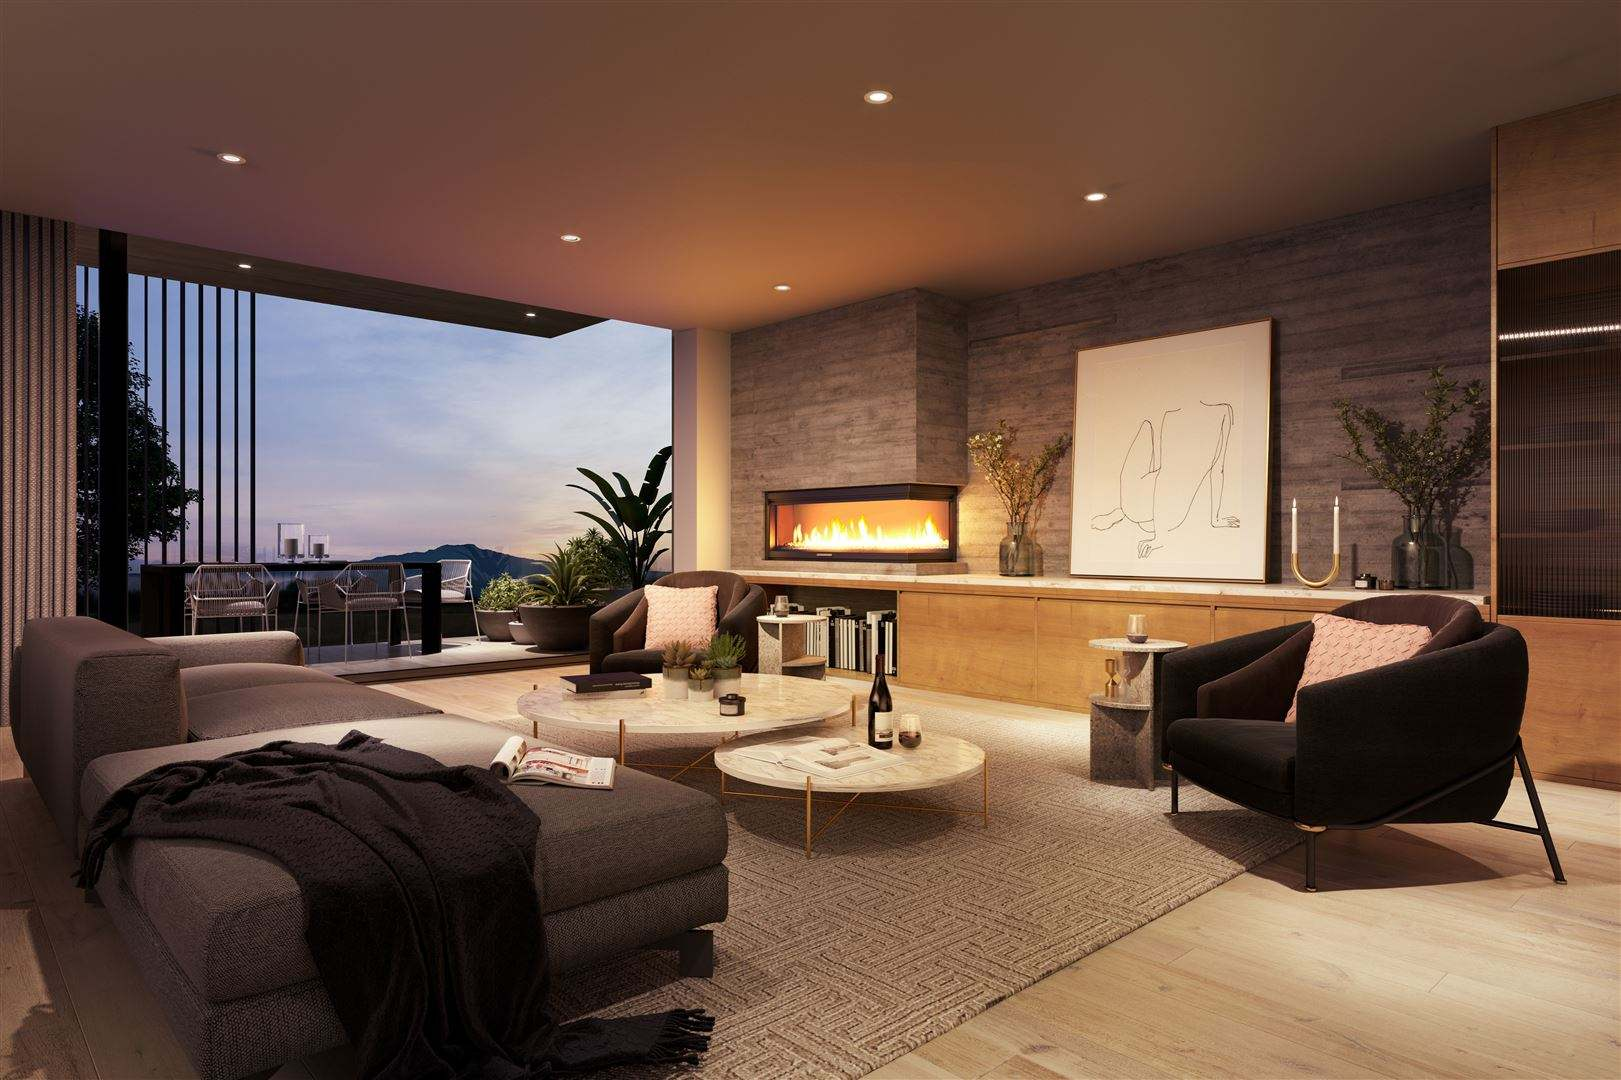 Milford 3房 Milford 110公寓 品质的象征 与湖海为伴 生活至臻至美 资源许可在手 即将动工! Milford 110 - Consent Granted, Selling Now!